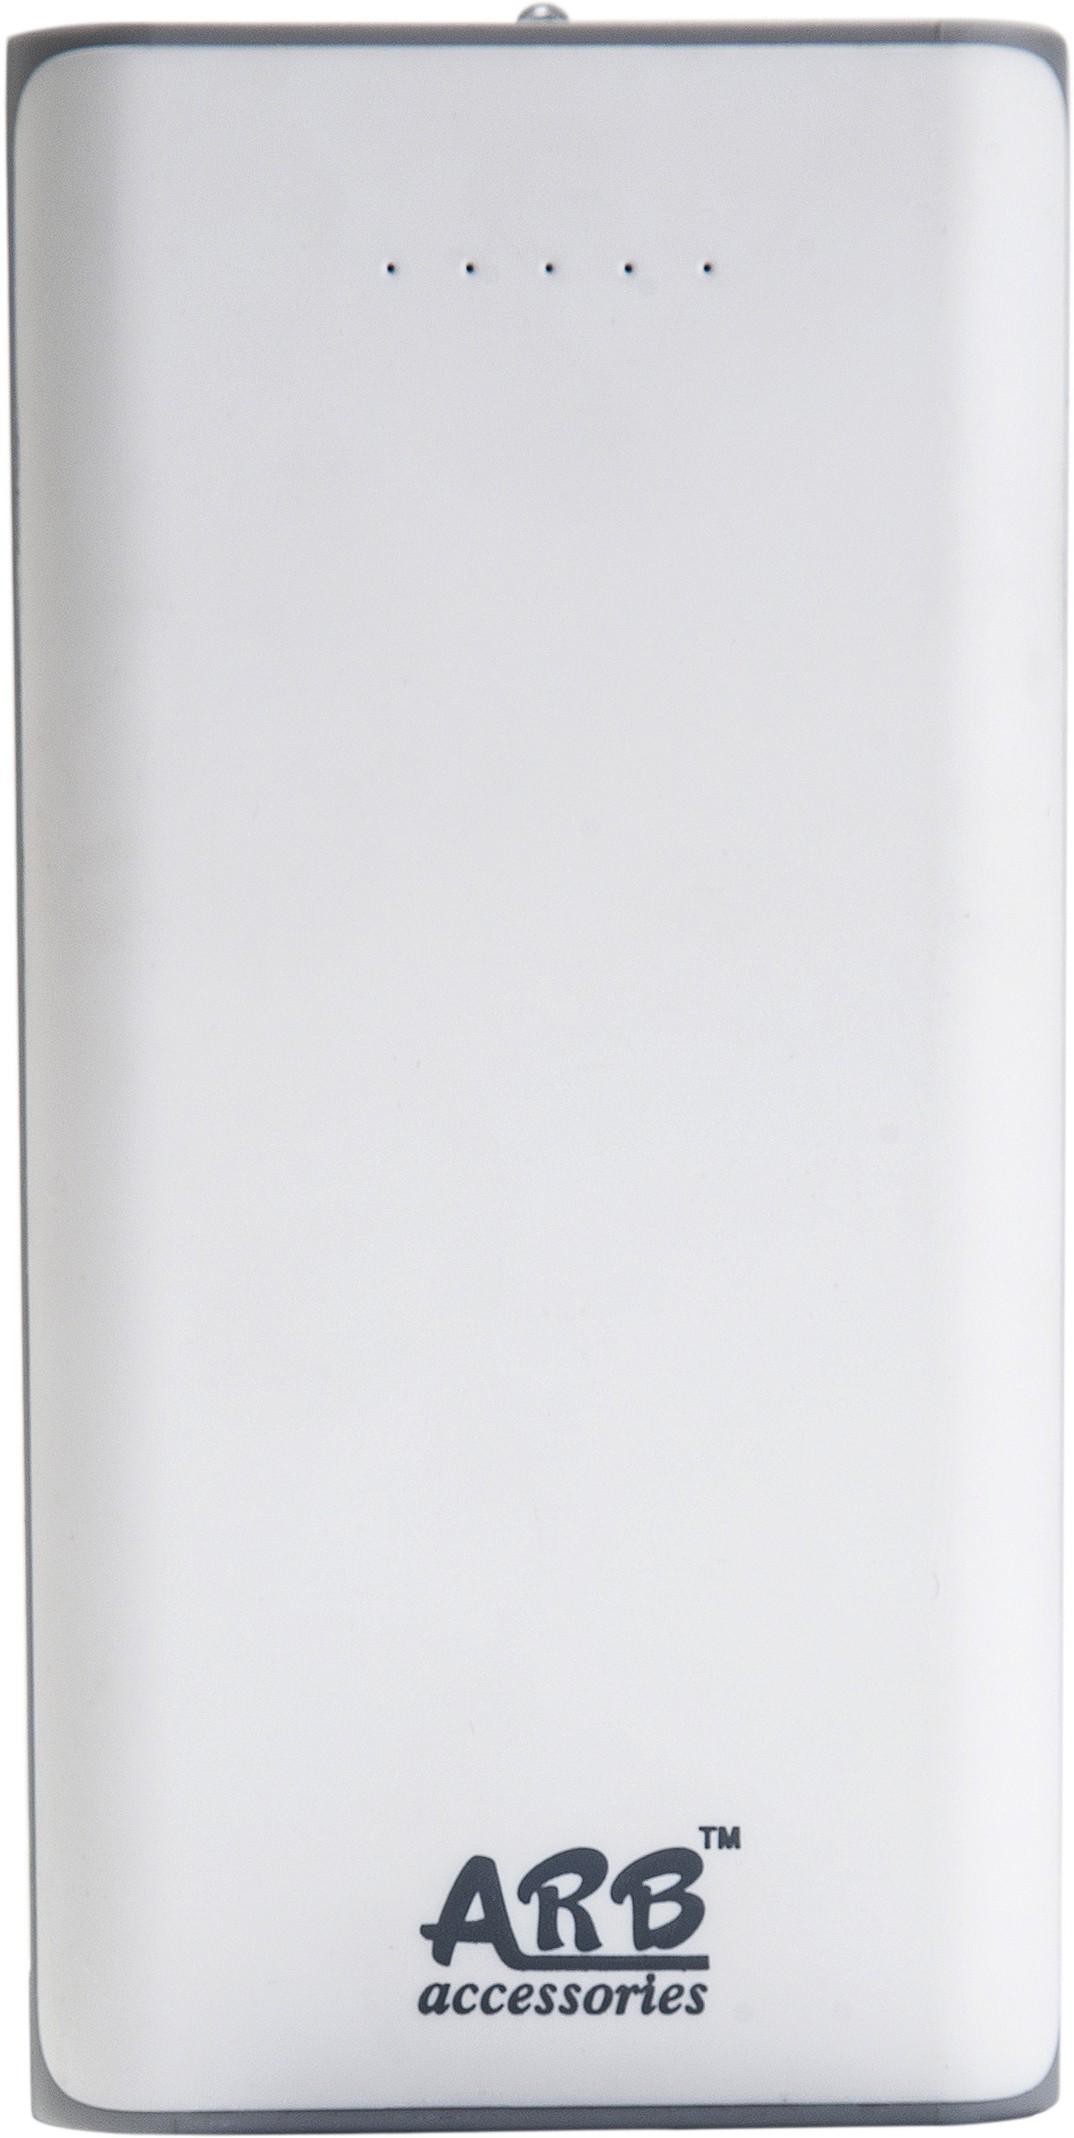 ARB AA-8 20800 mAh Power Bank(White, Lithium-ion)